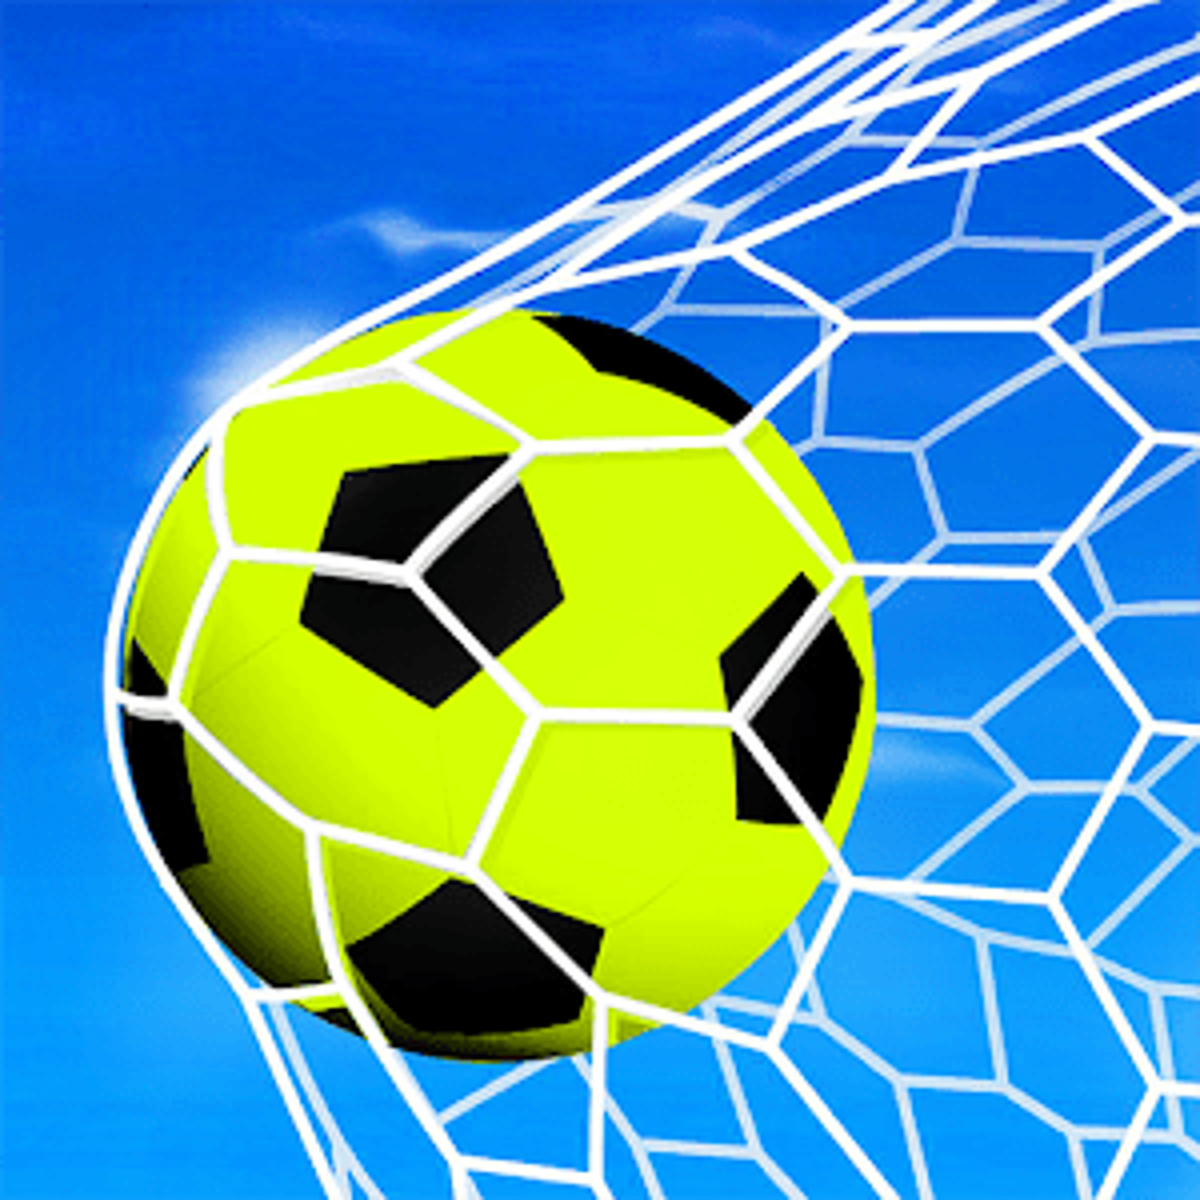 Penalty Shoot Football Match Soccer Game